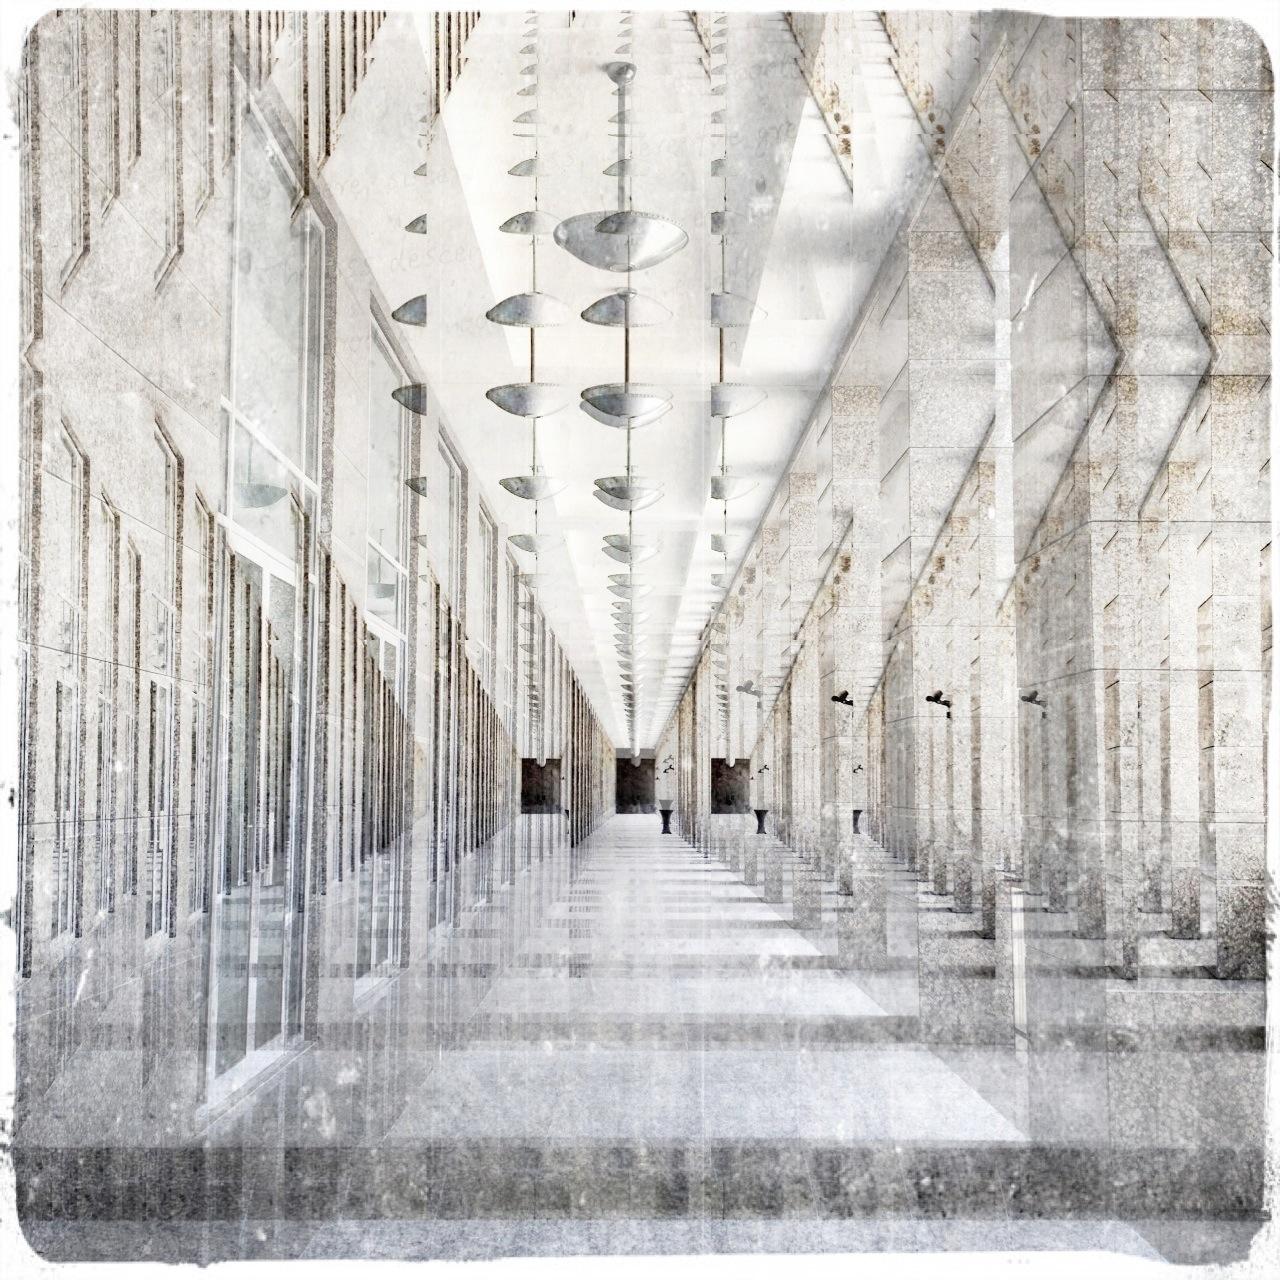 Corridors of Cyberspace II by Linda Hollier